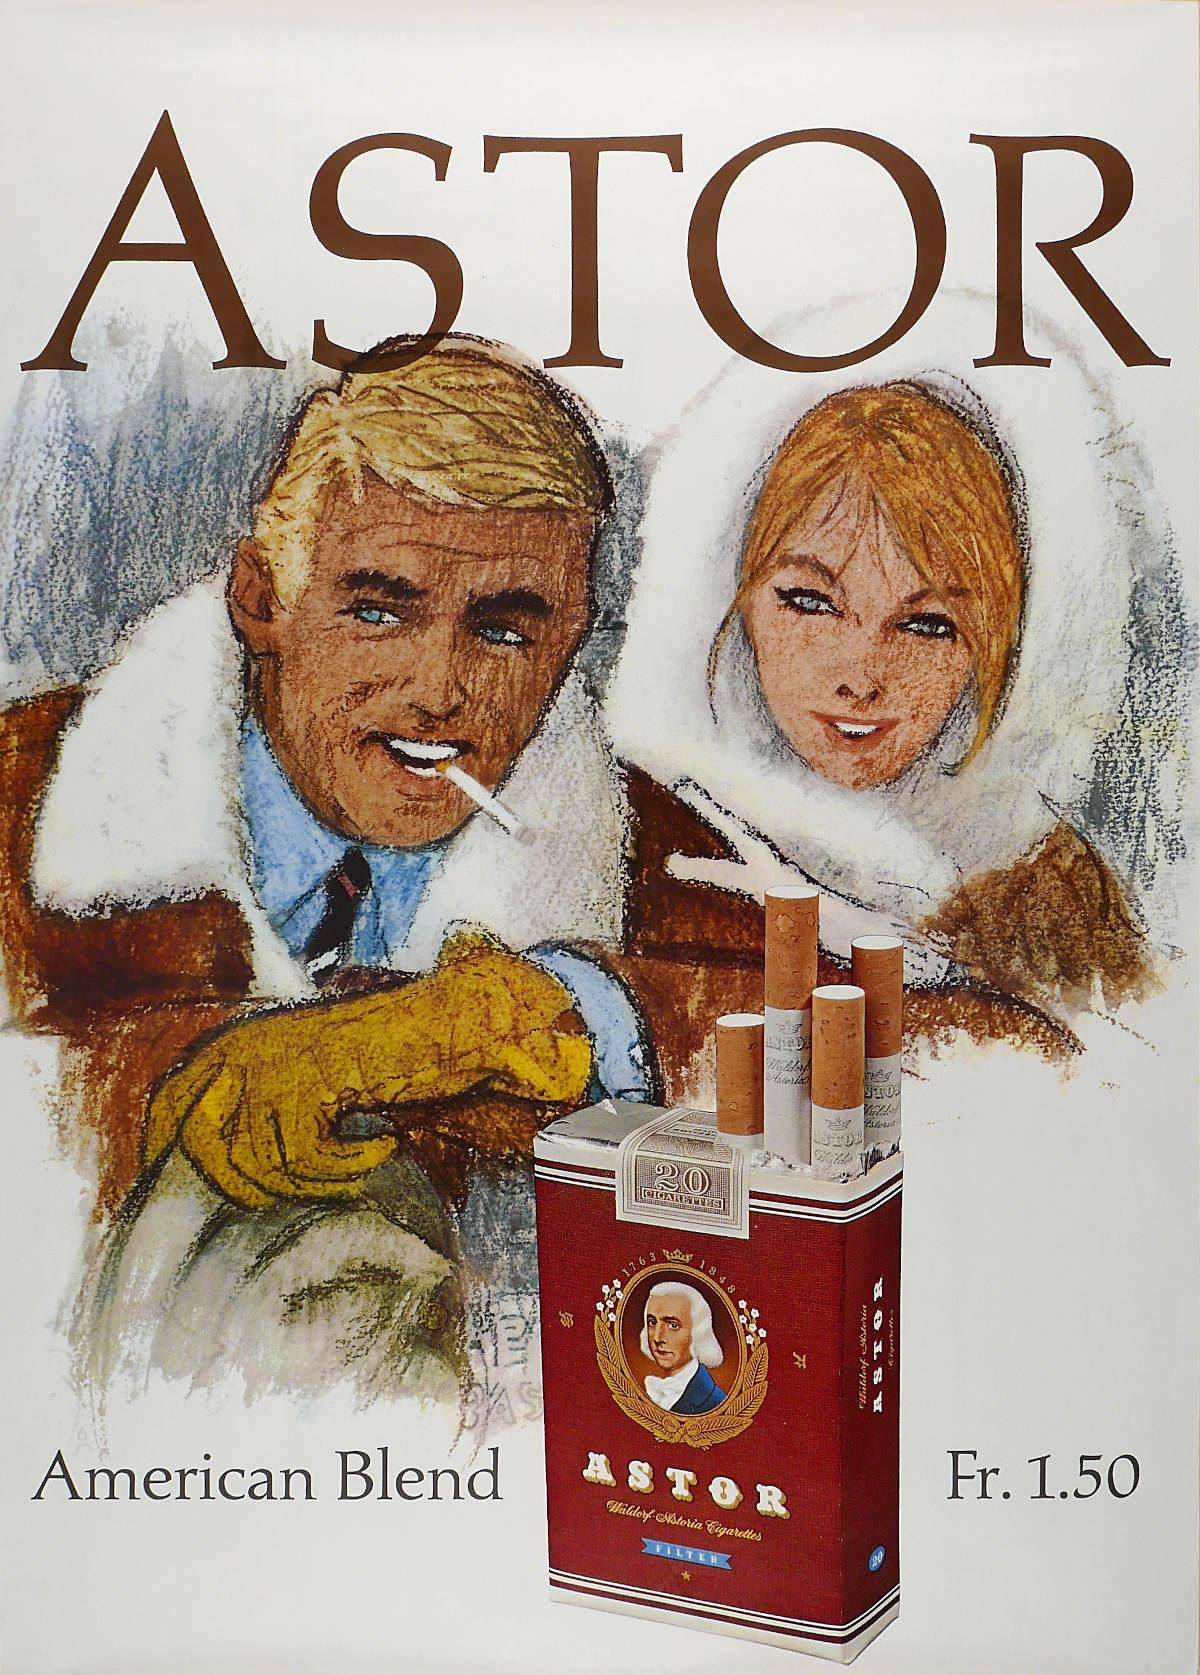 Astor American Blend Fr. 1.50, Artist unknown